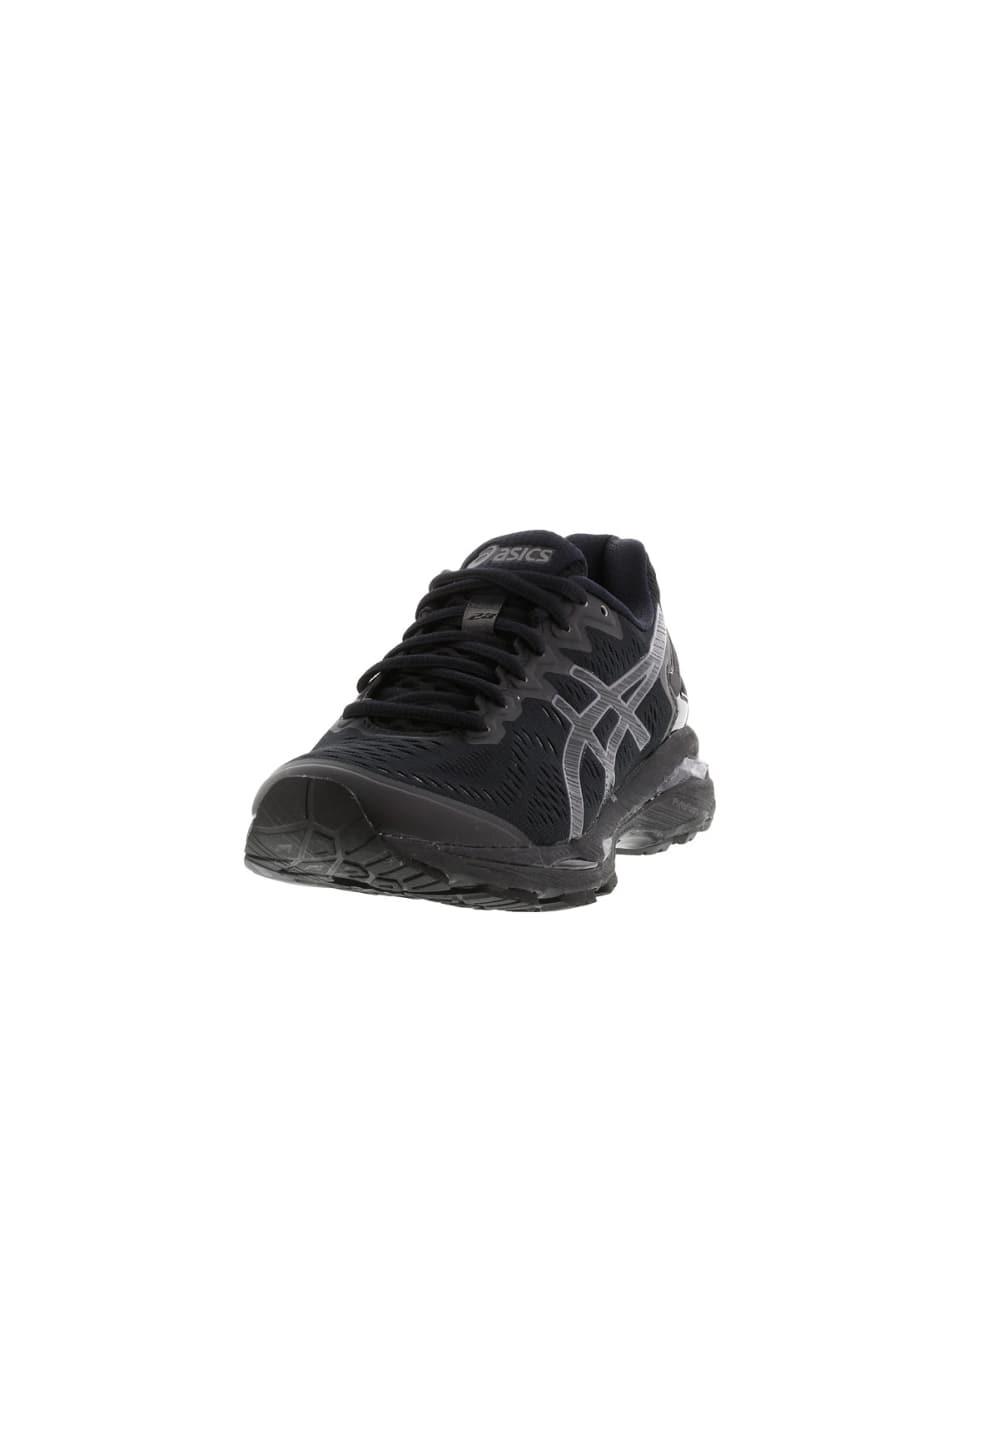 innovative design f211b 636c5 ASICS GEL-Kayano 23 - Running shoes for Women - Black